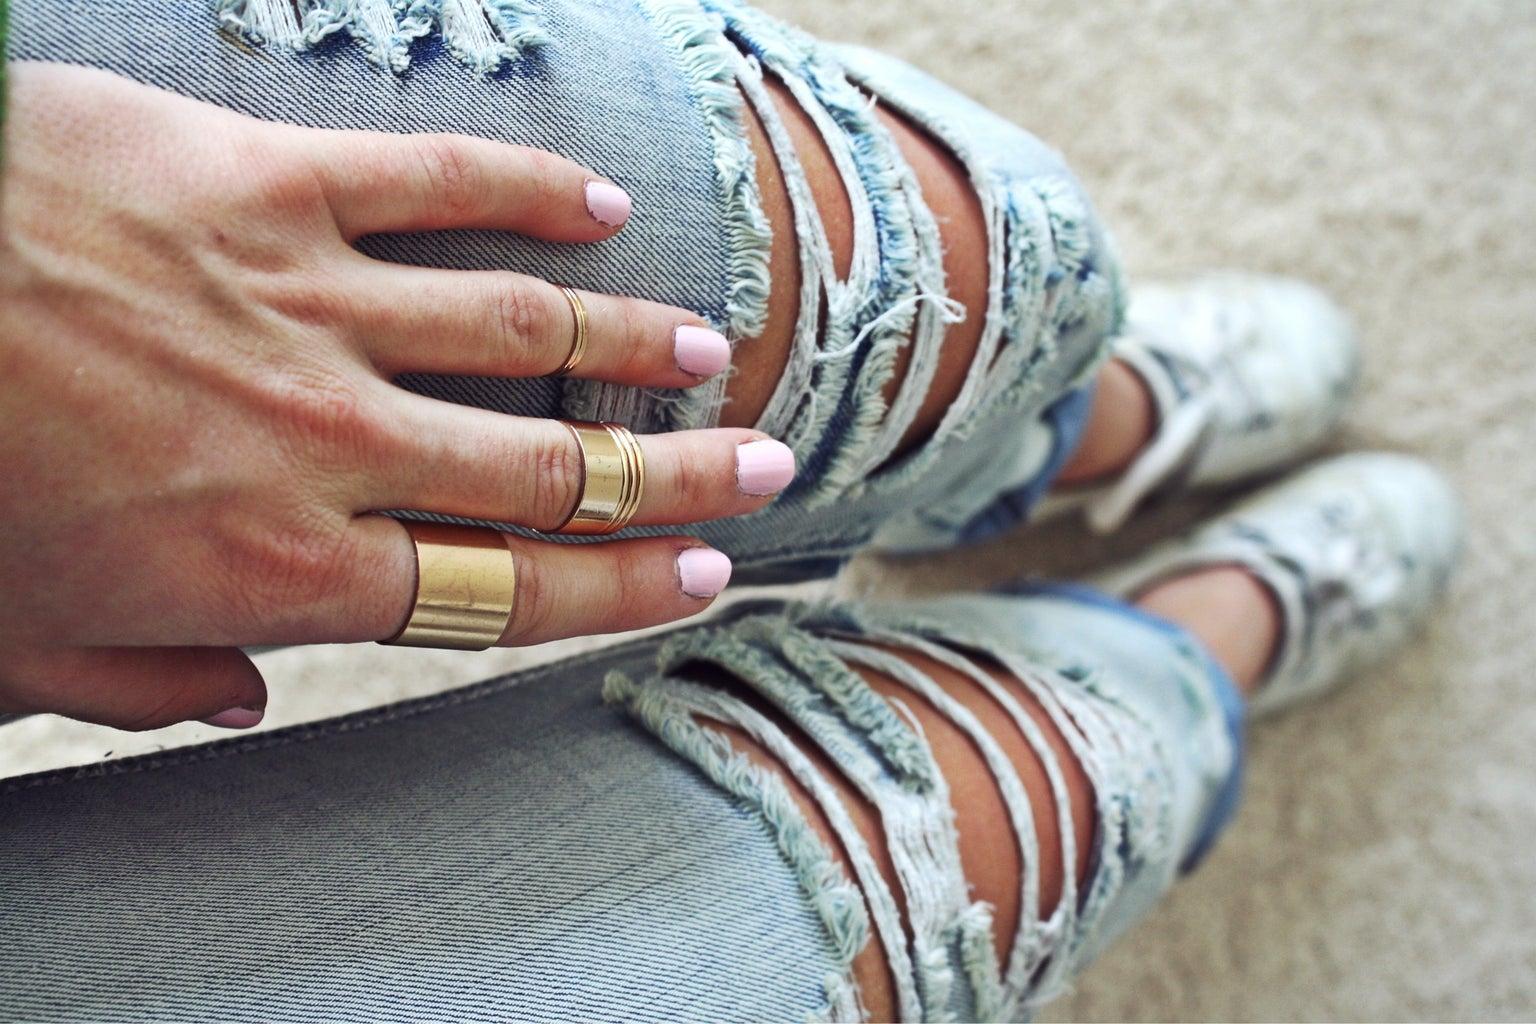 Anna Schultz-Ripped Jeans